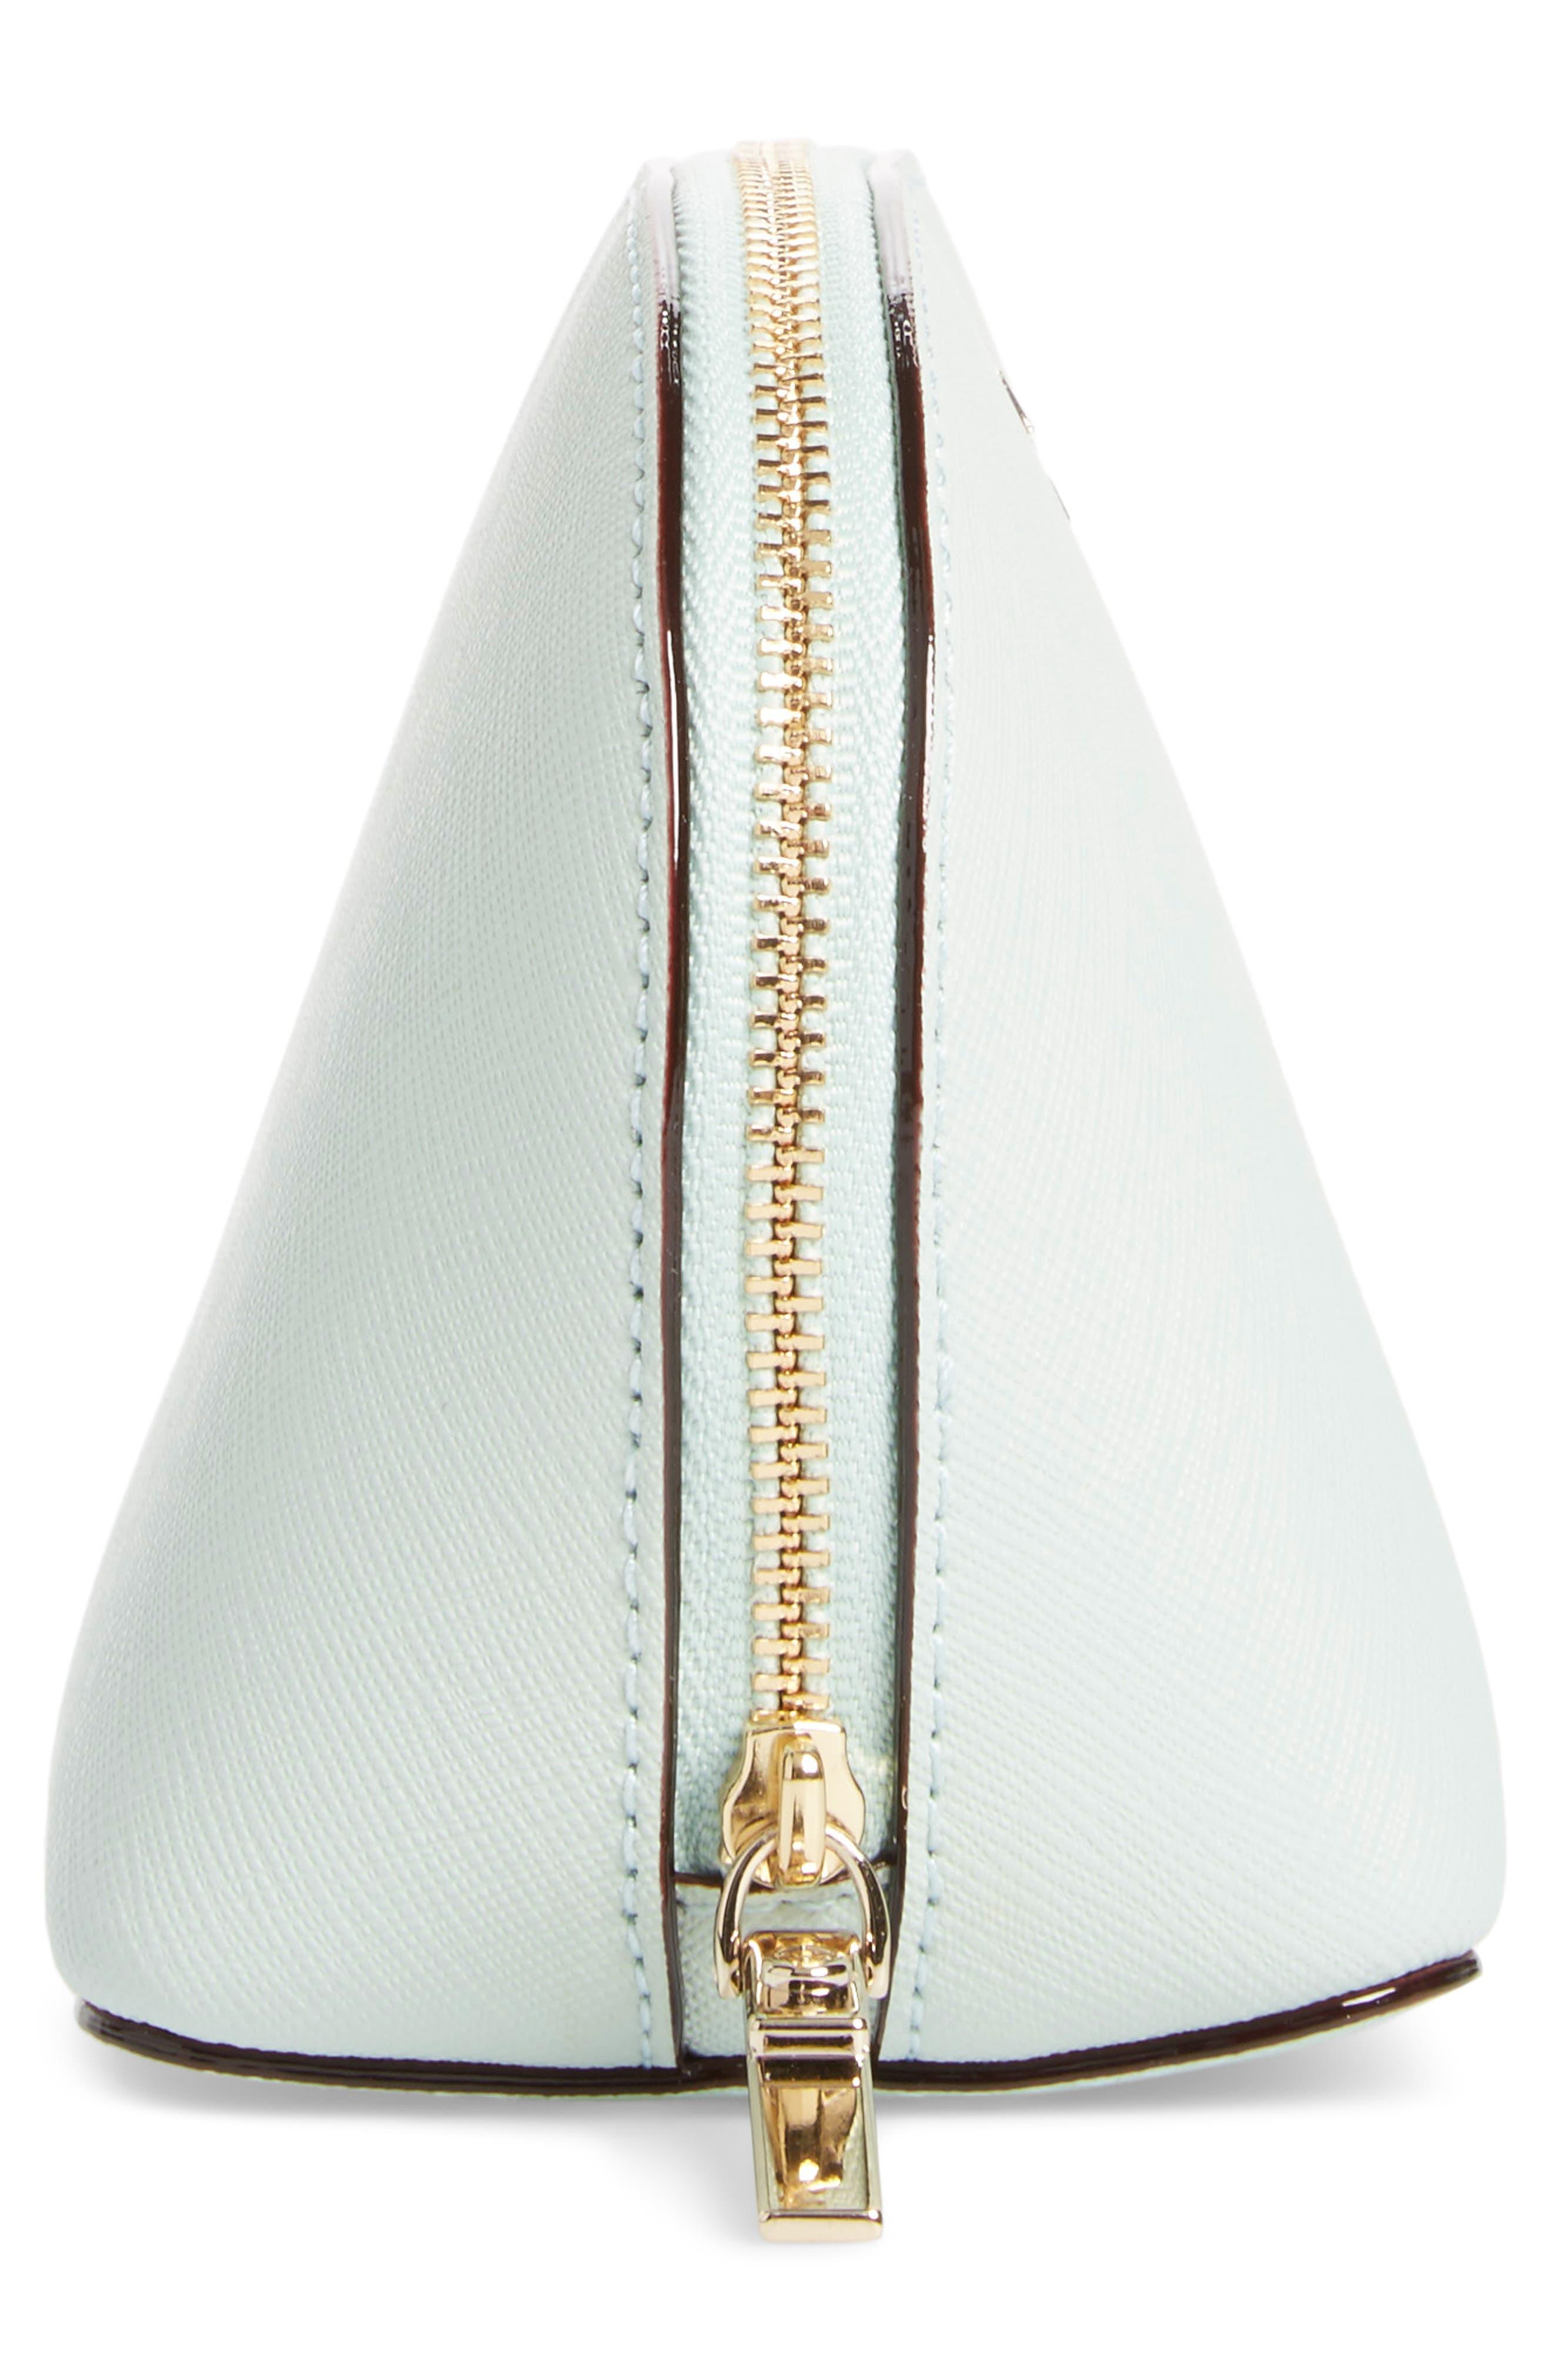 cameron street - small abalene leather cosmetics bag,                             Alternate thumbnail 4, color,                             Misty Mint